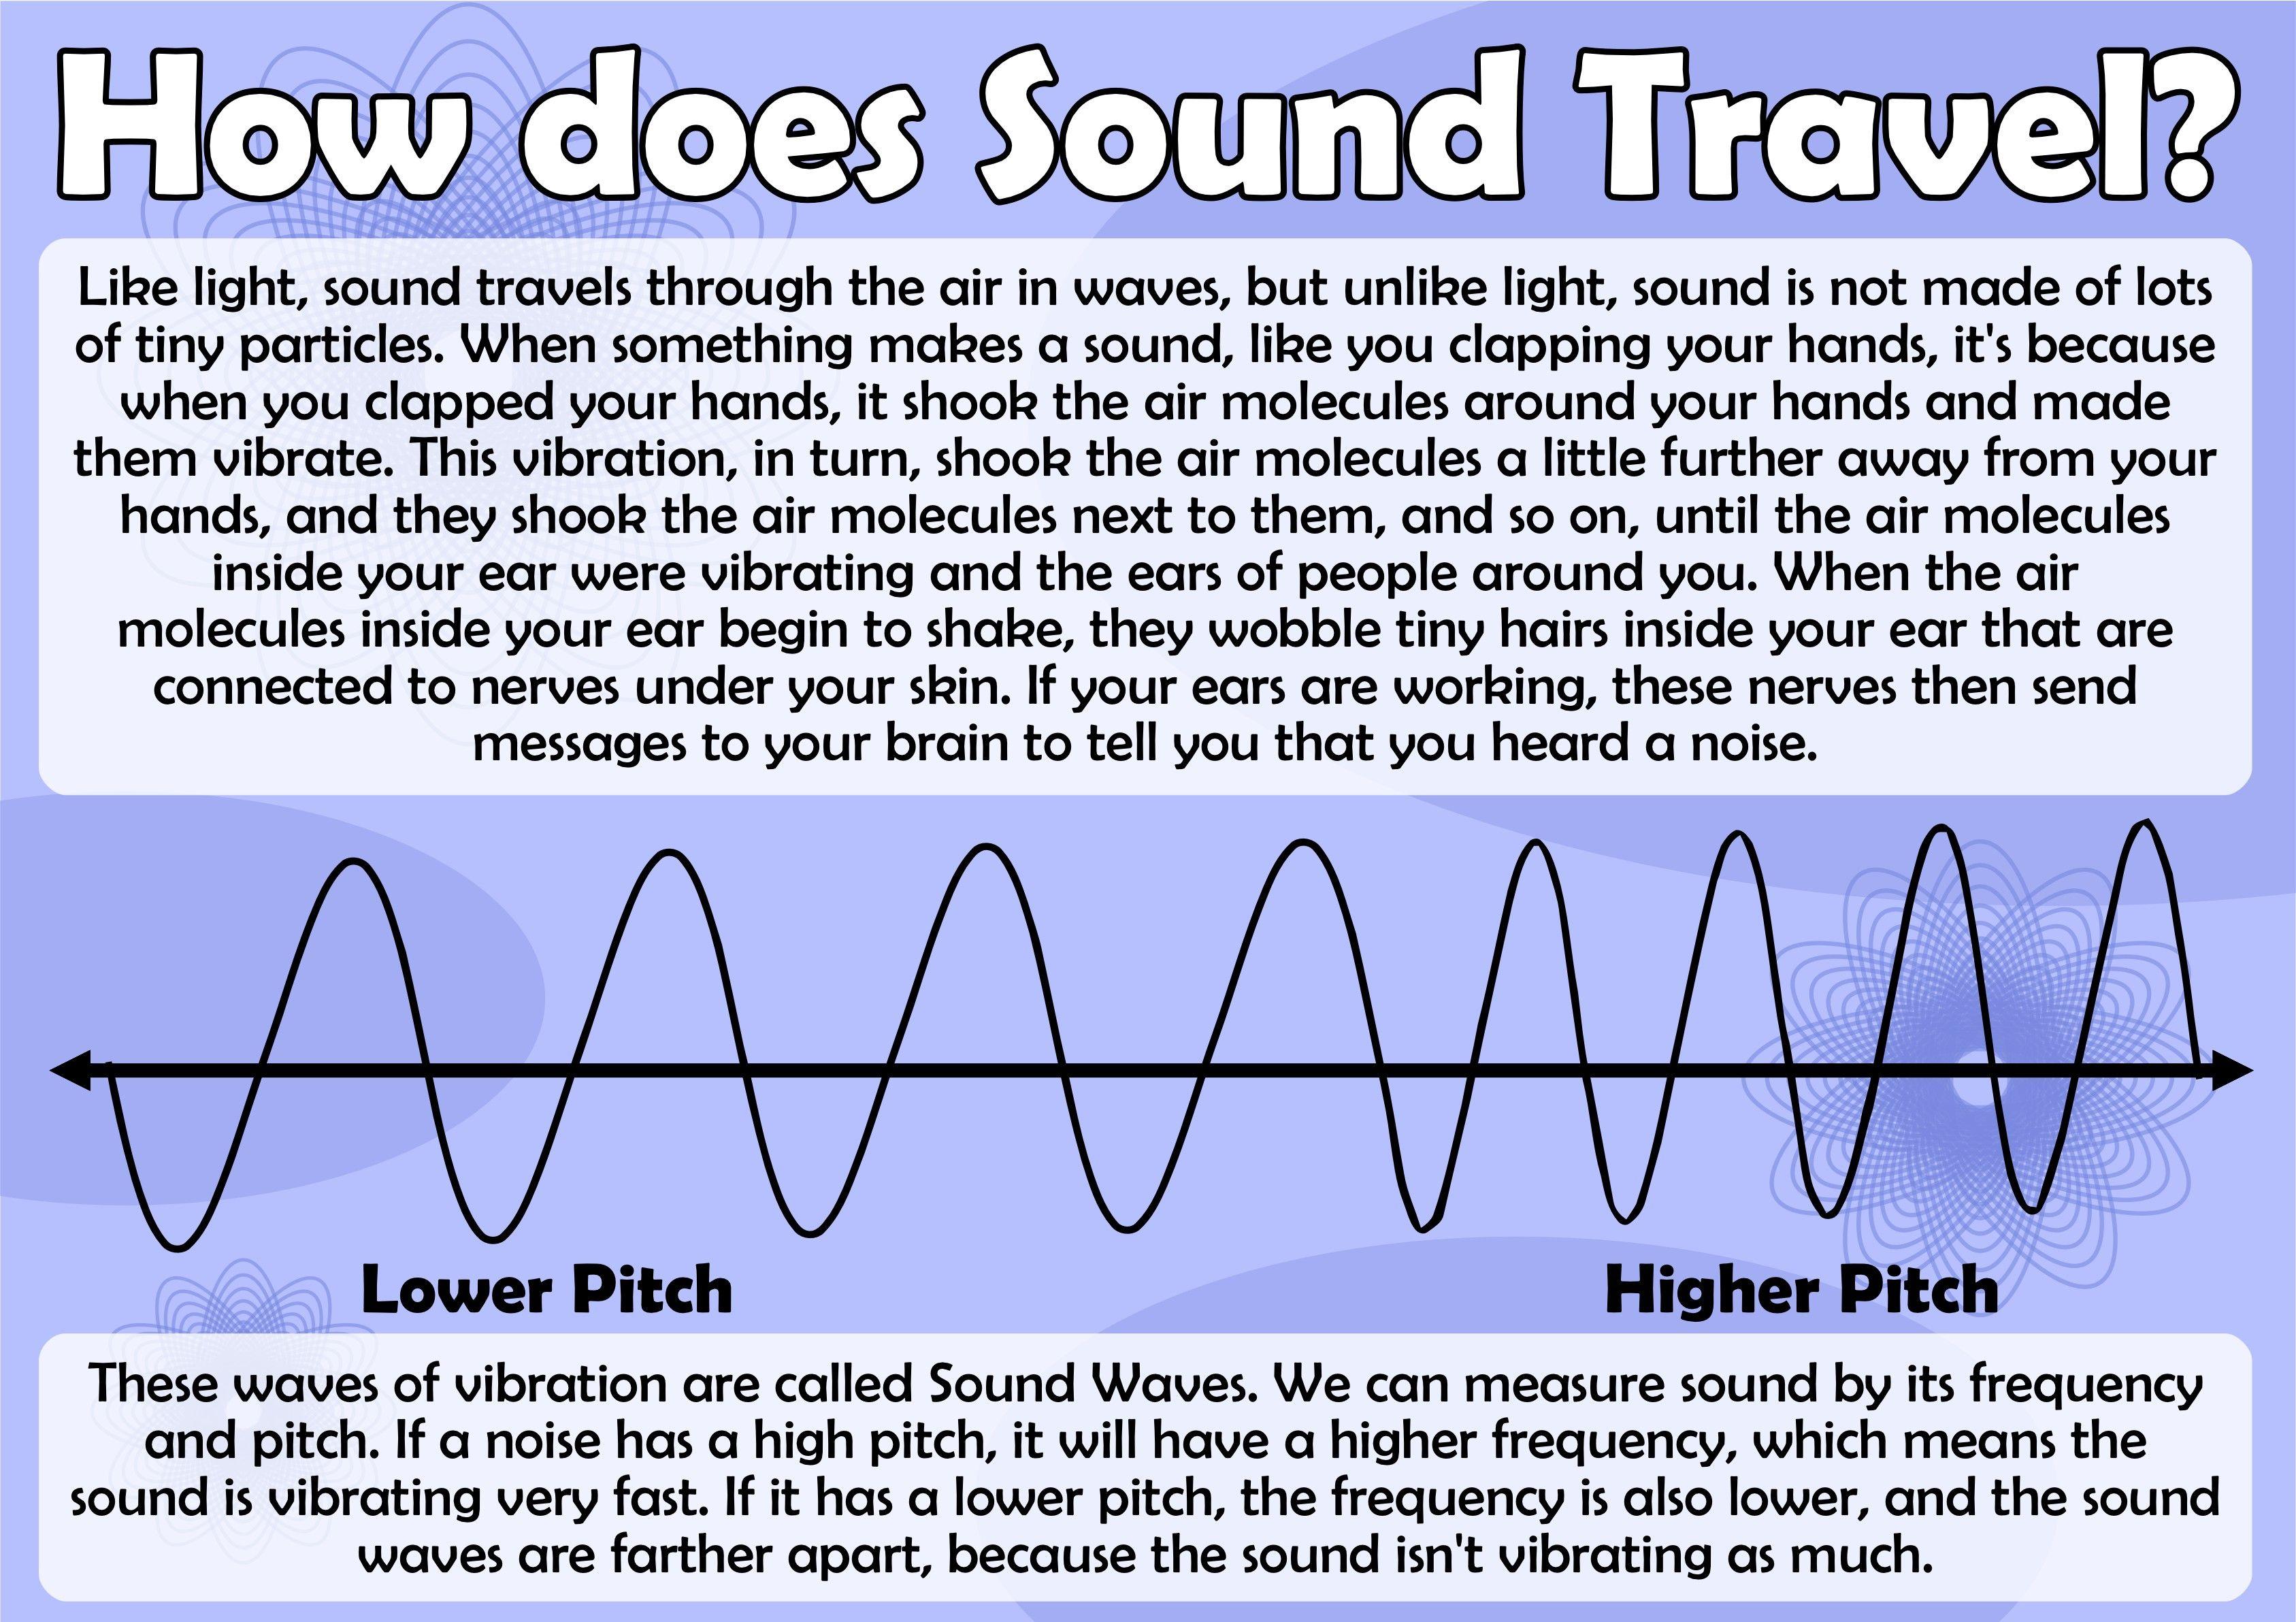 how does sound travel poster science sound science pinterest. Black Bedroom Furniture Sets. Home Design Ideas